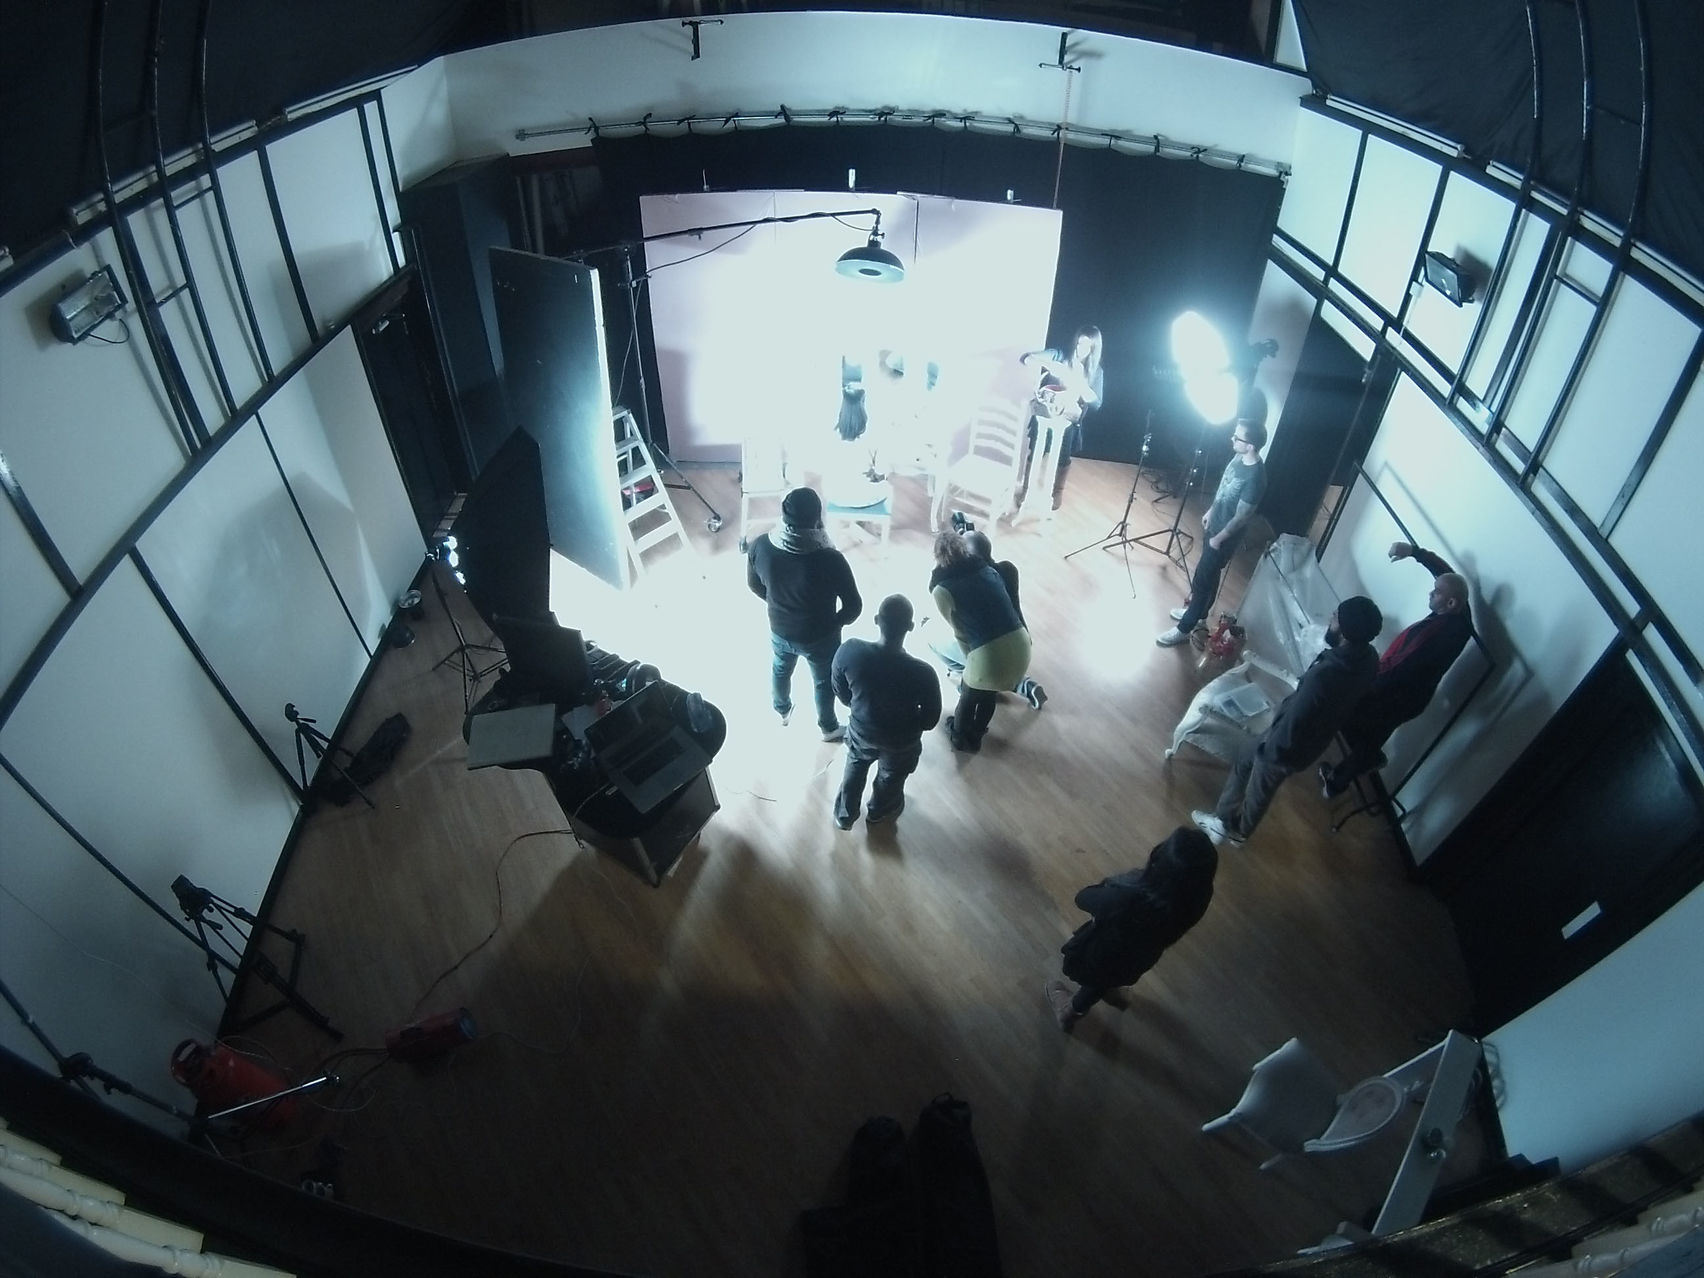 Studio One - Professional Photographic Studio Hire, Simulacra Studio